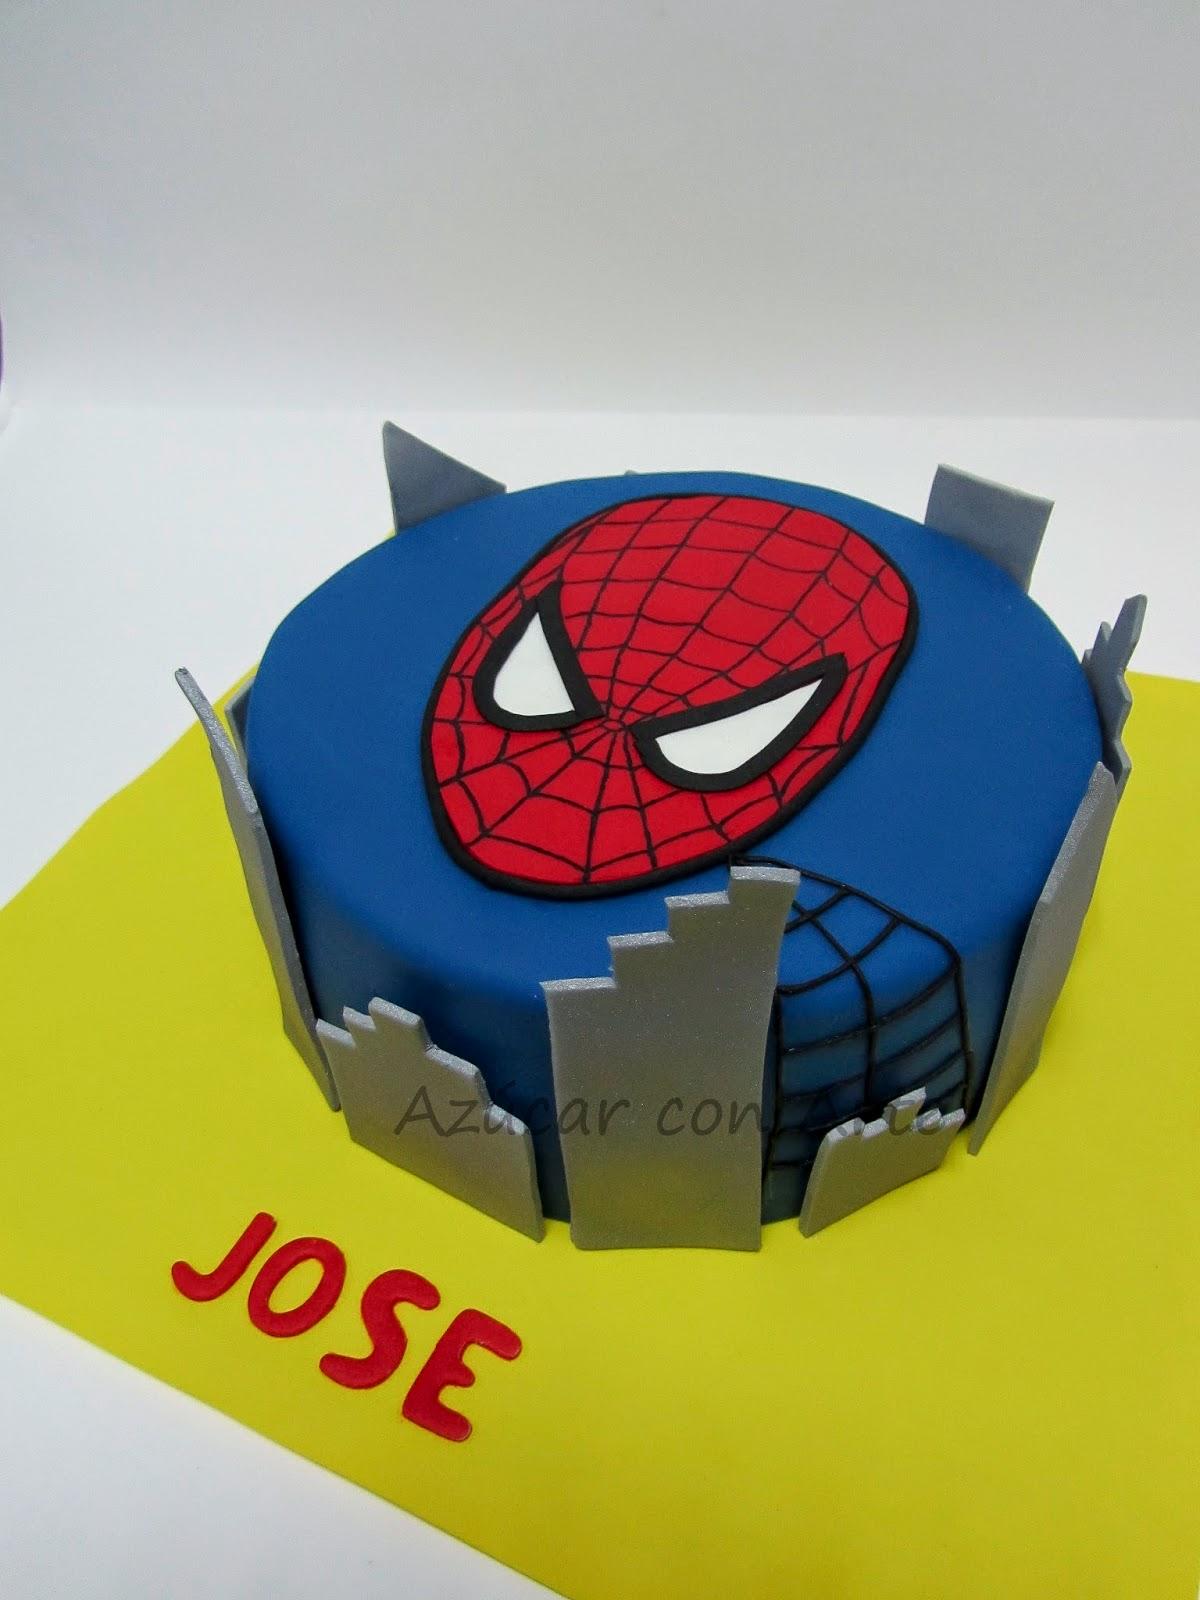 spideman cake, tarta spiderman, tarta sin gluten, gluten free cake | azucar con arte